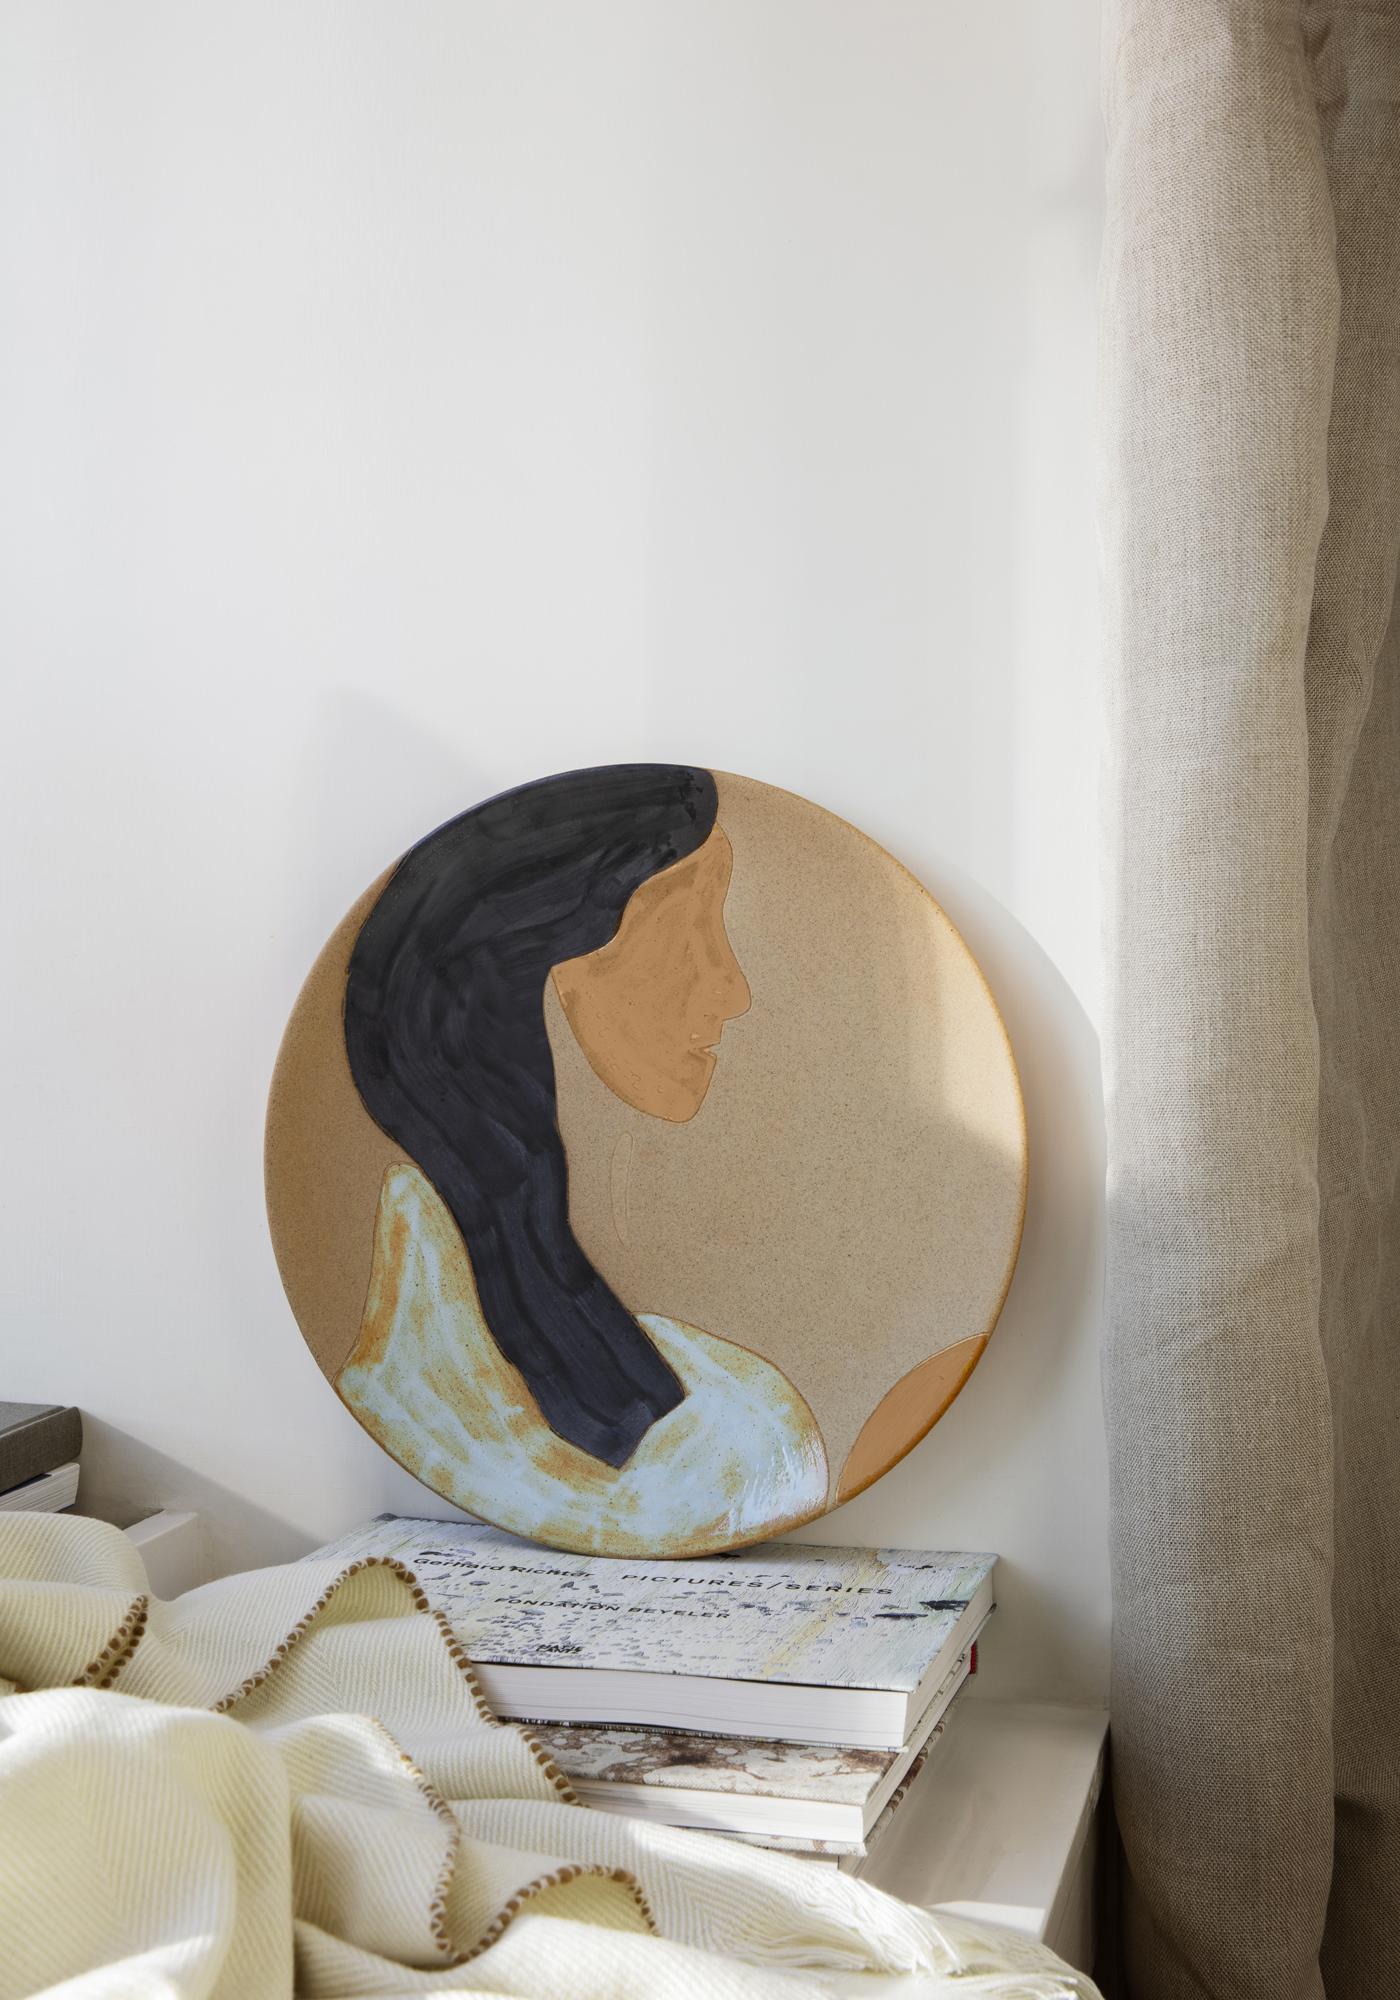 Ferm Living Collection AW19 Céramiques